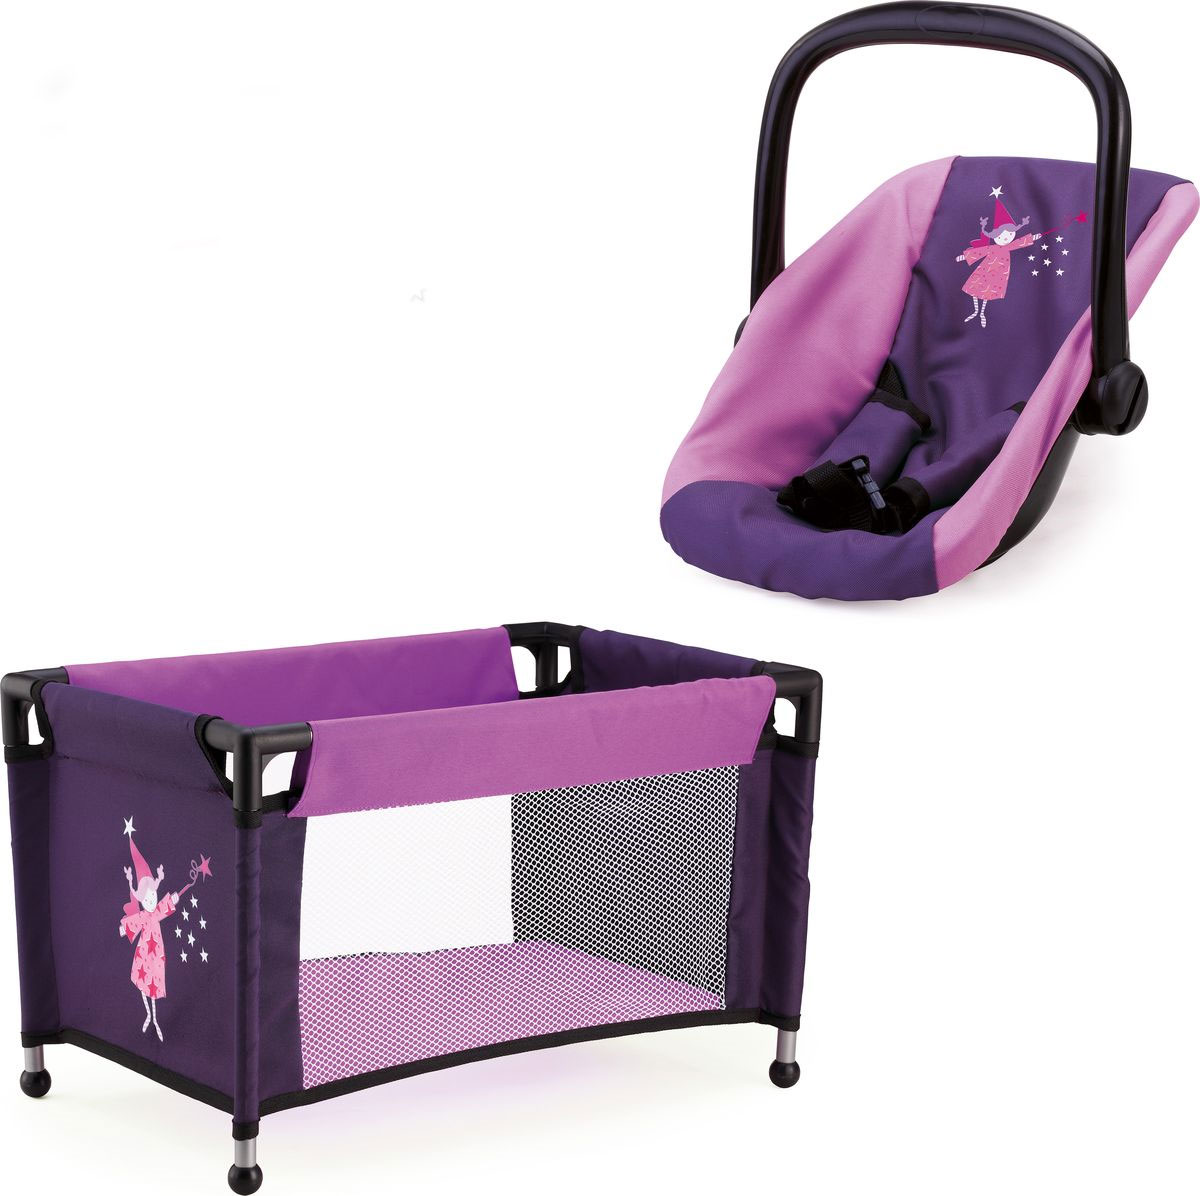 Bayer Аксессуар для кукол Переноска и кроватка игровые наборы bayer набор для кукол стульчик кенгурушка сумка посуда